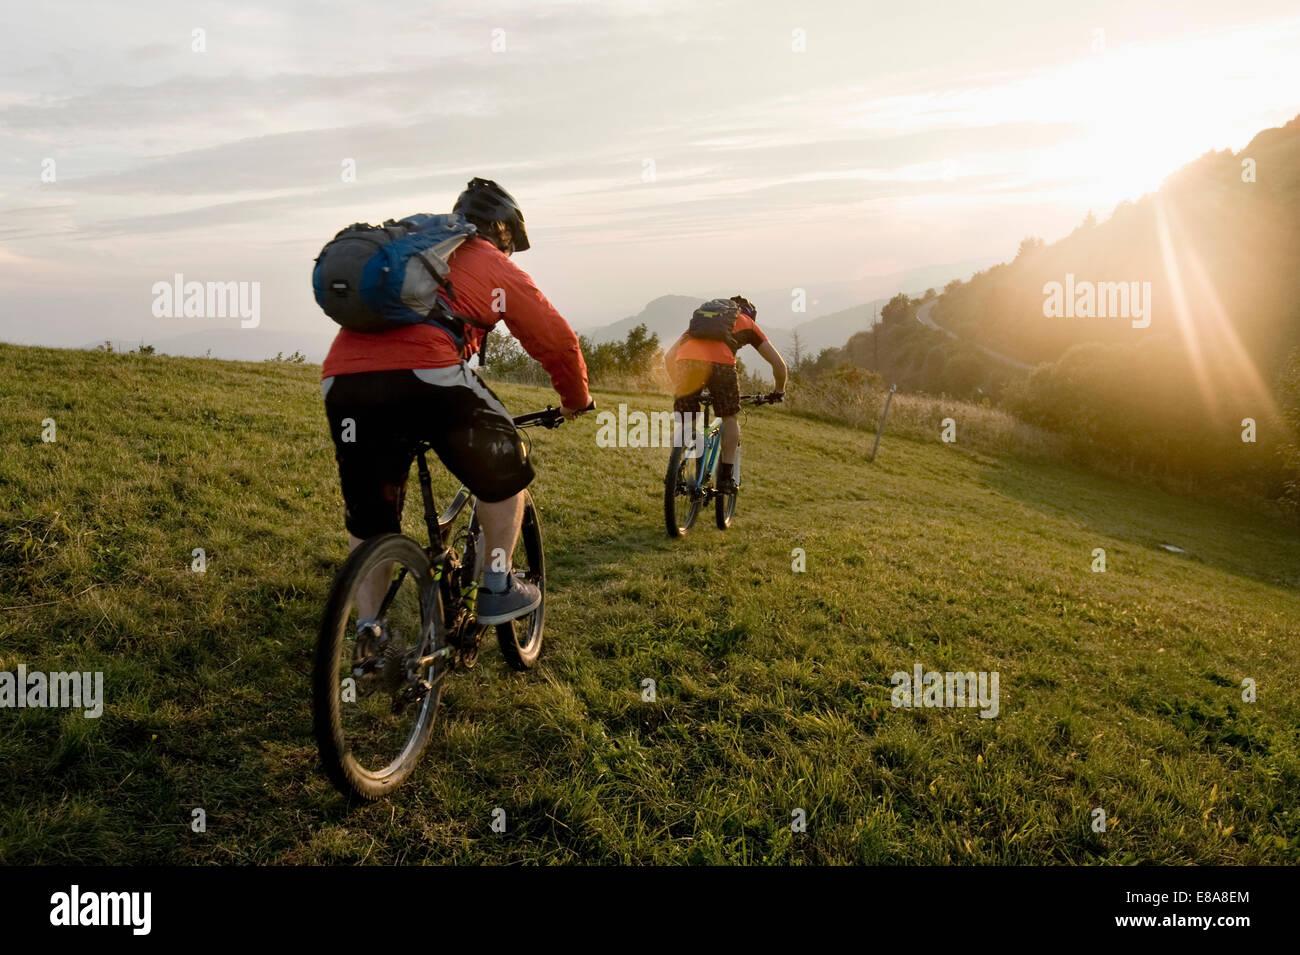 zwei Mountainbiker auf dem Weg bei Sonnenuntergang, Kolovrat, Istrien, Slowenien Stockbild